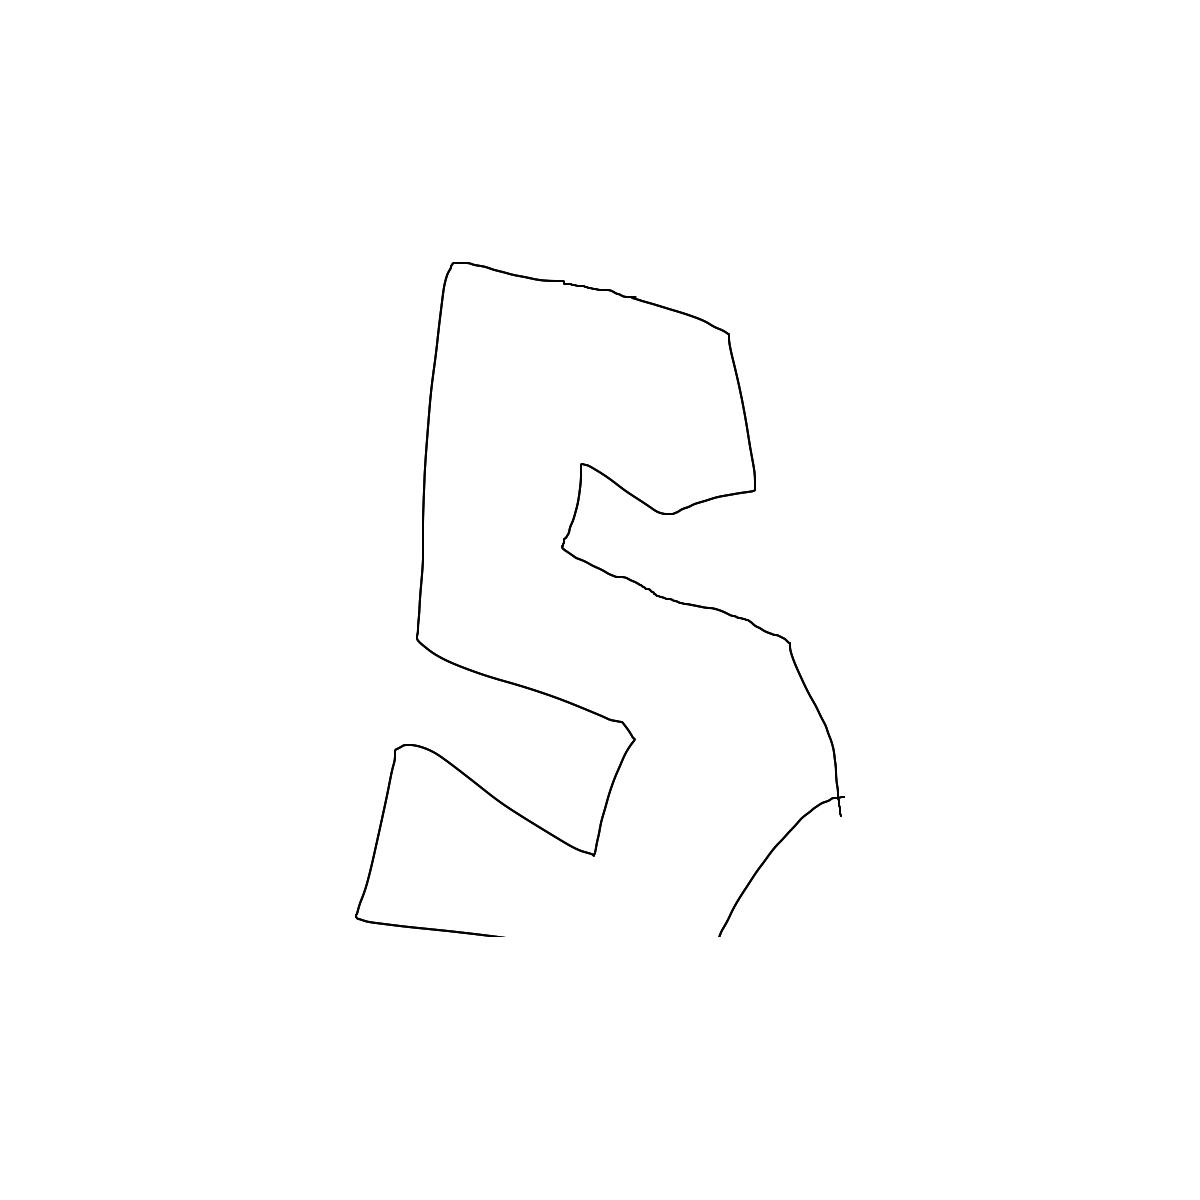 BAAAM drawing#249 lat:40.7446975708007800lng: -74.0238647460937500